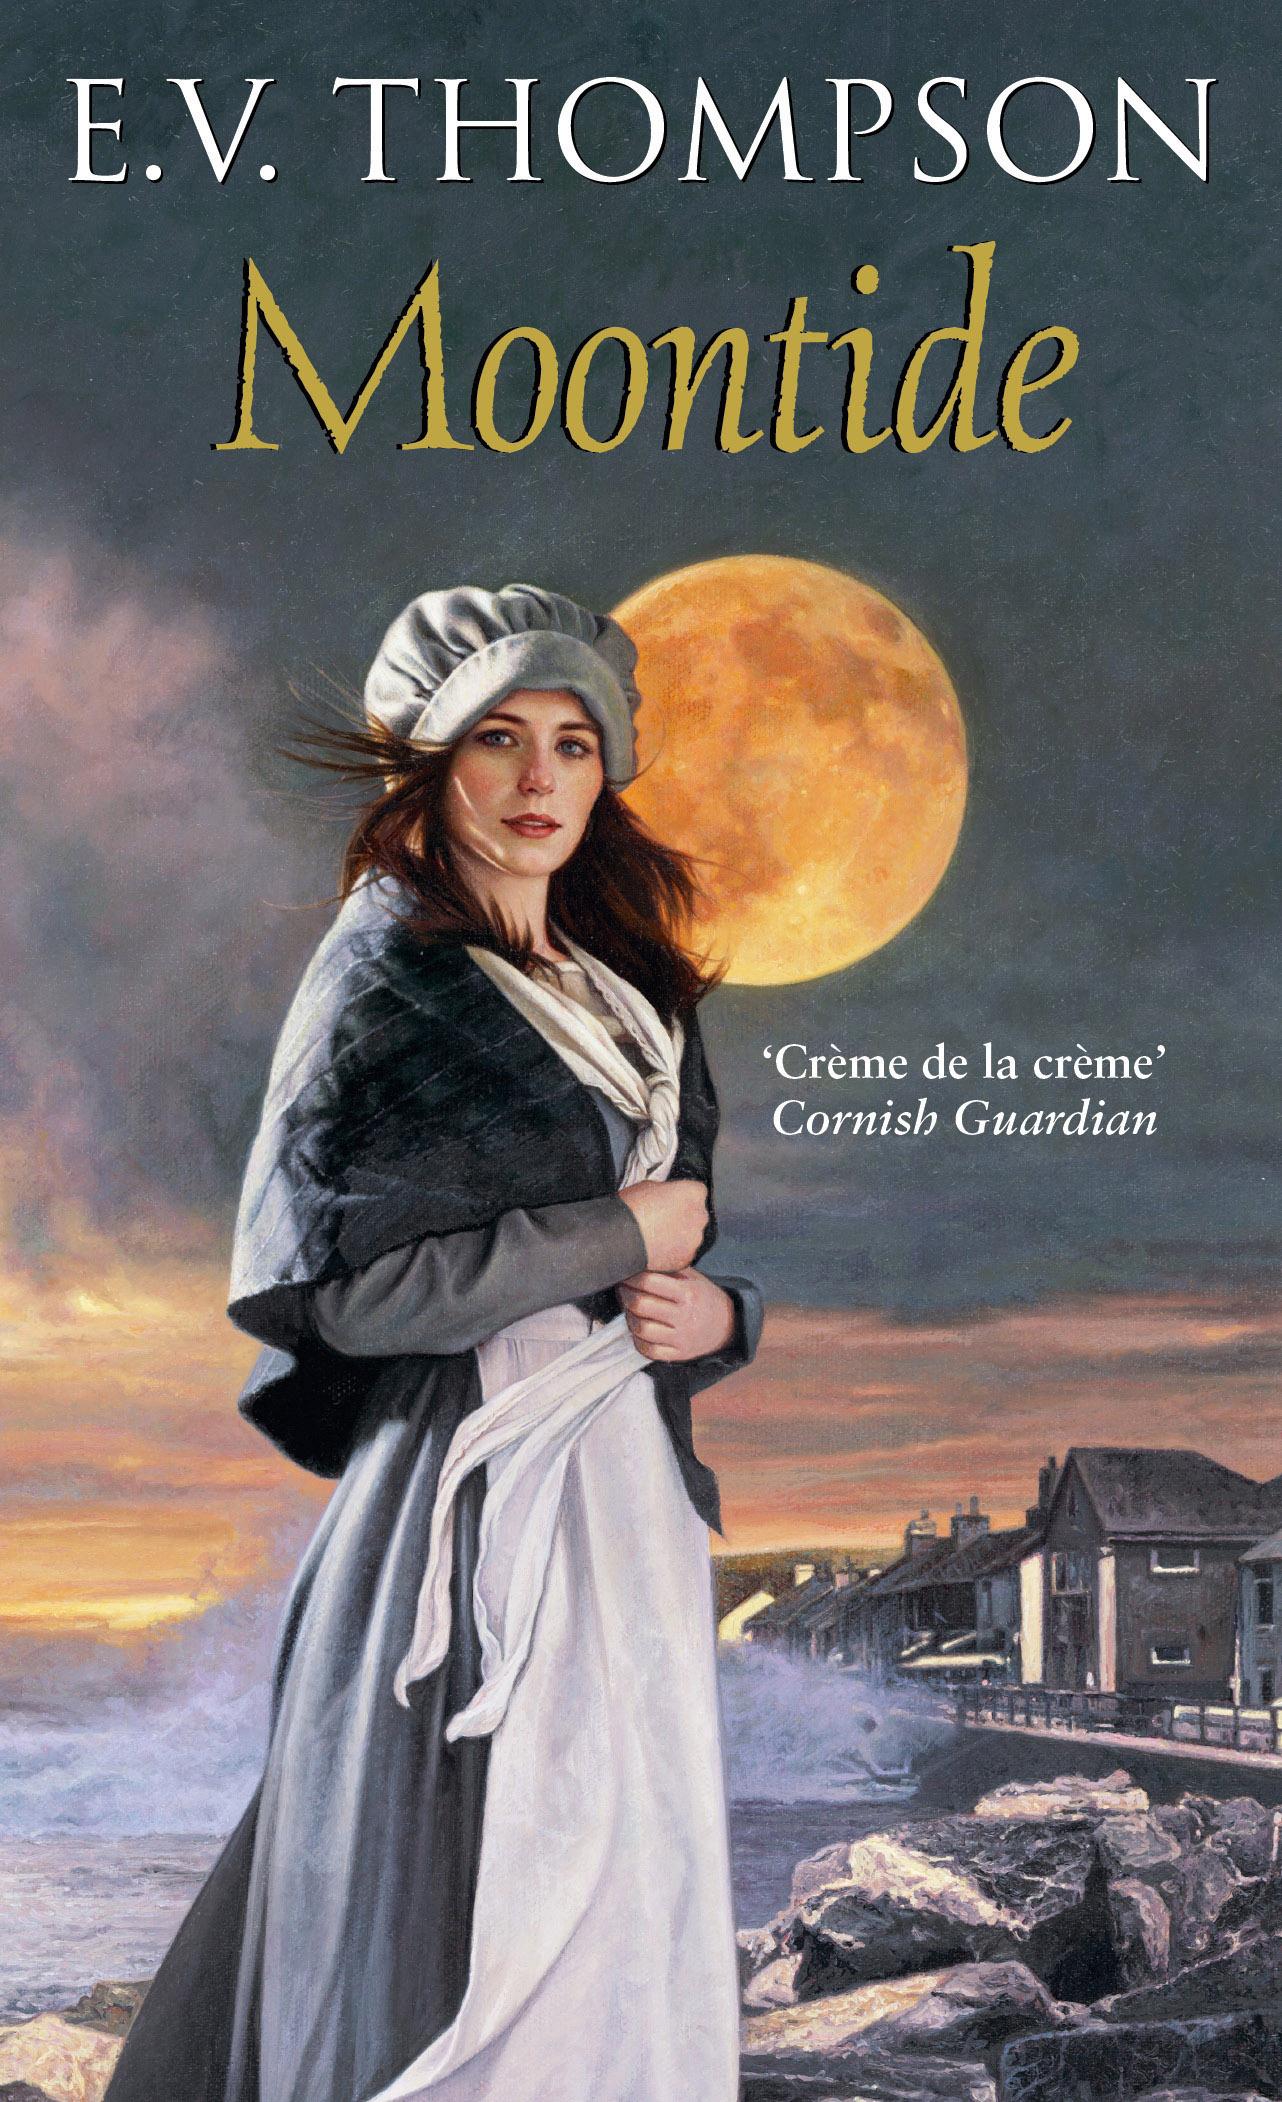 Moontide by E. V. Thompson - Books - Hachette Australia b156c2c90bb